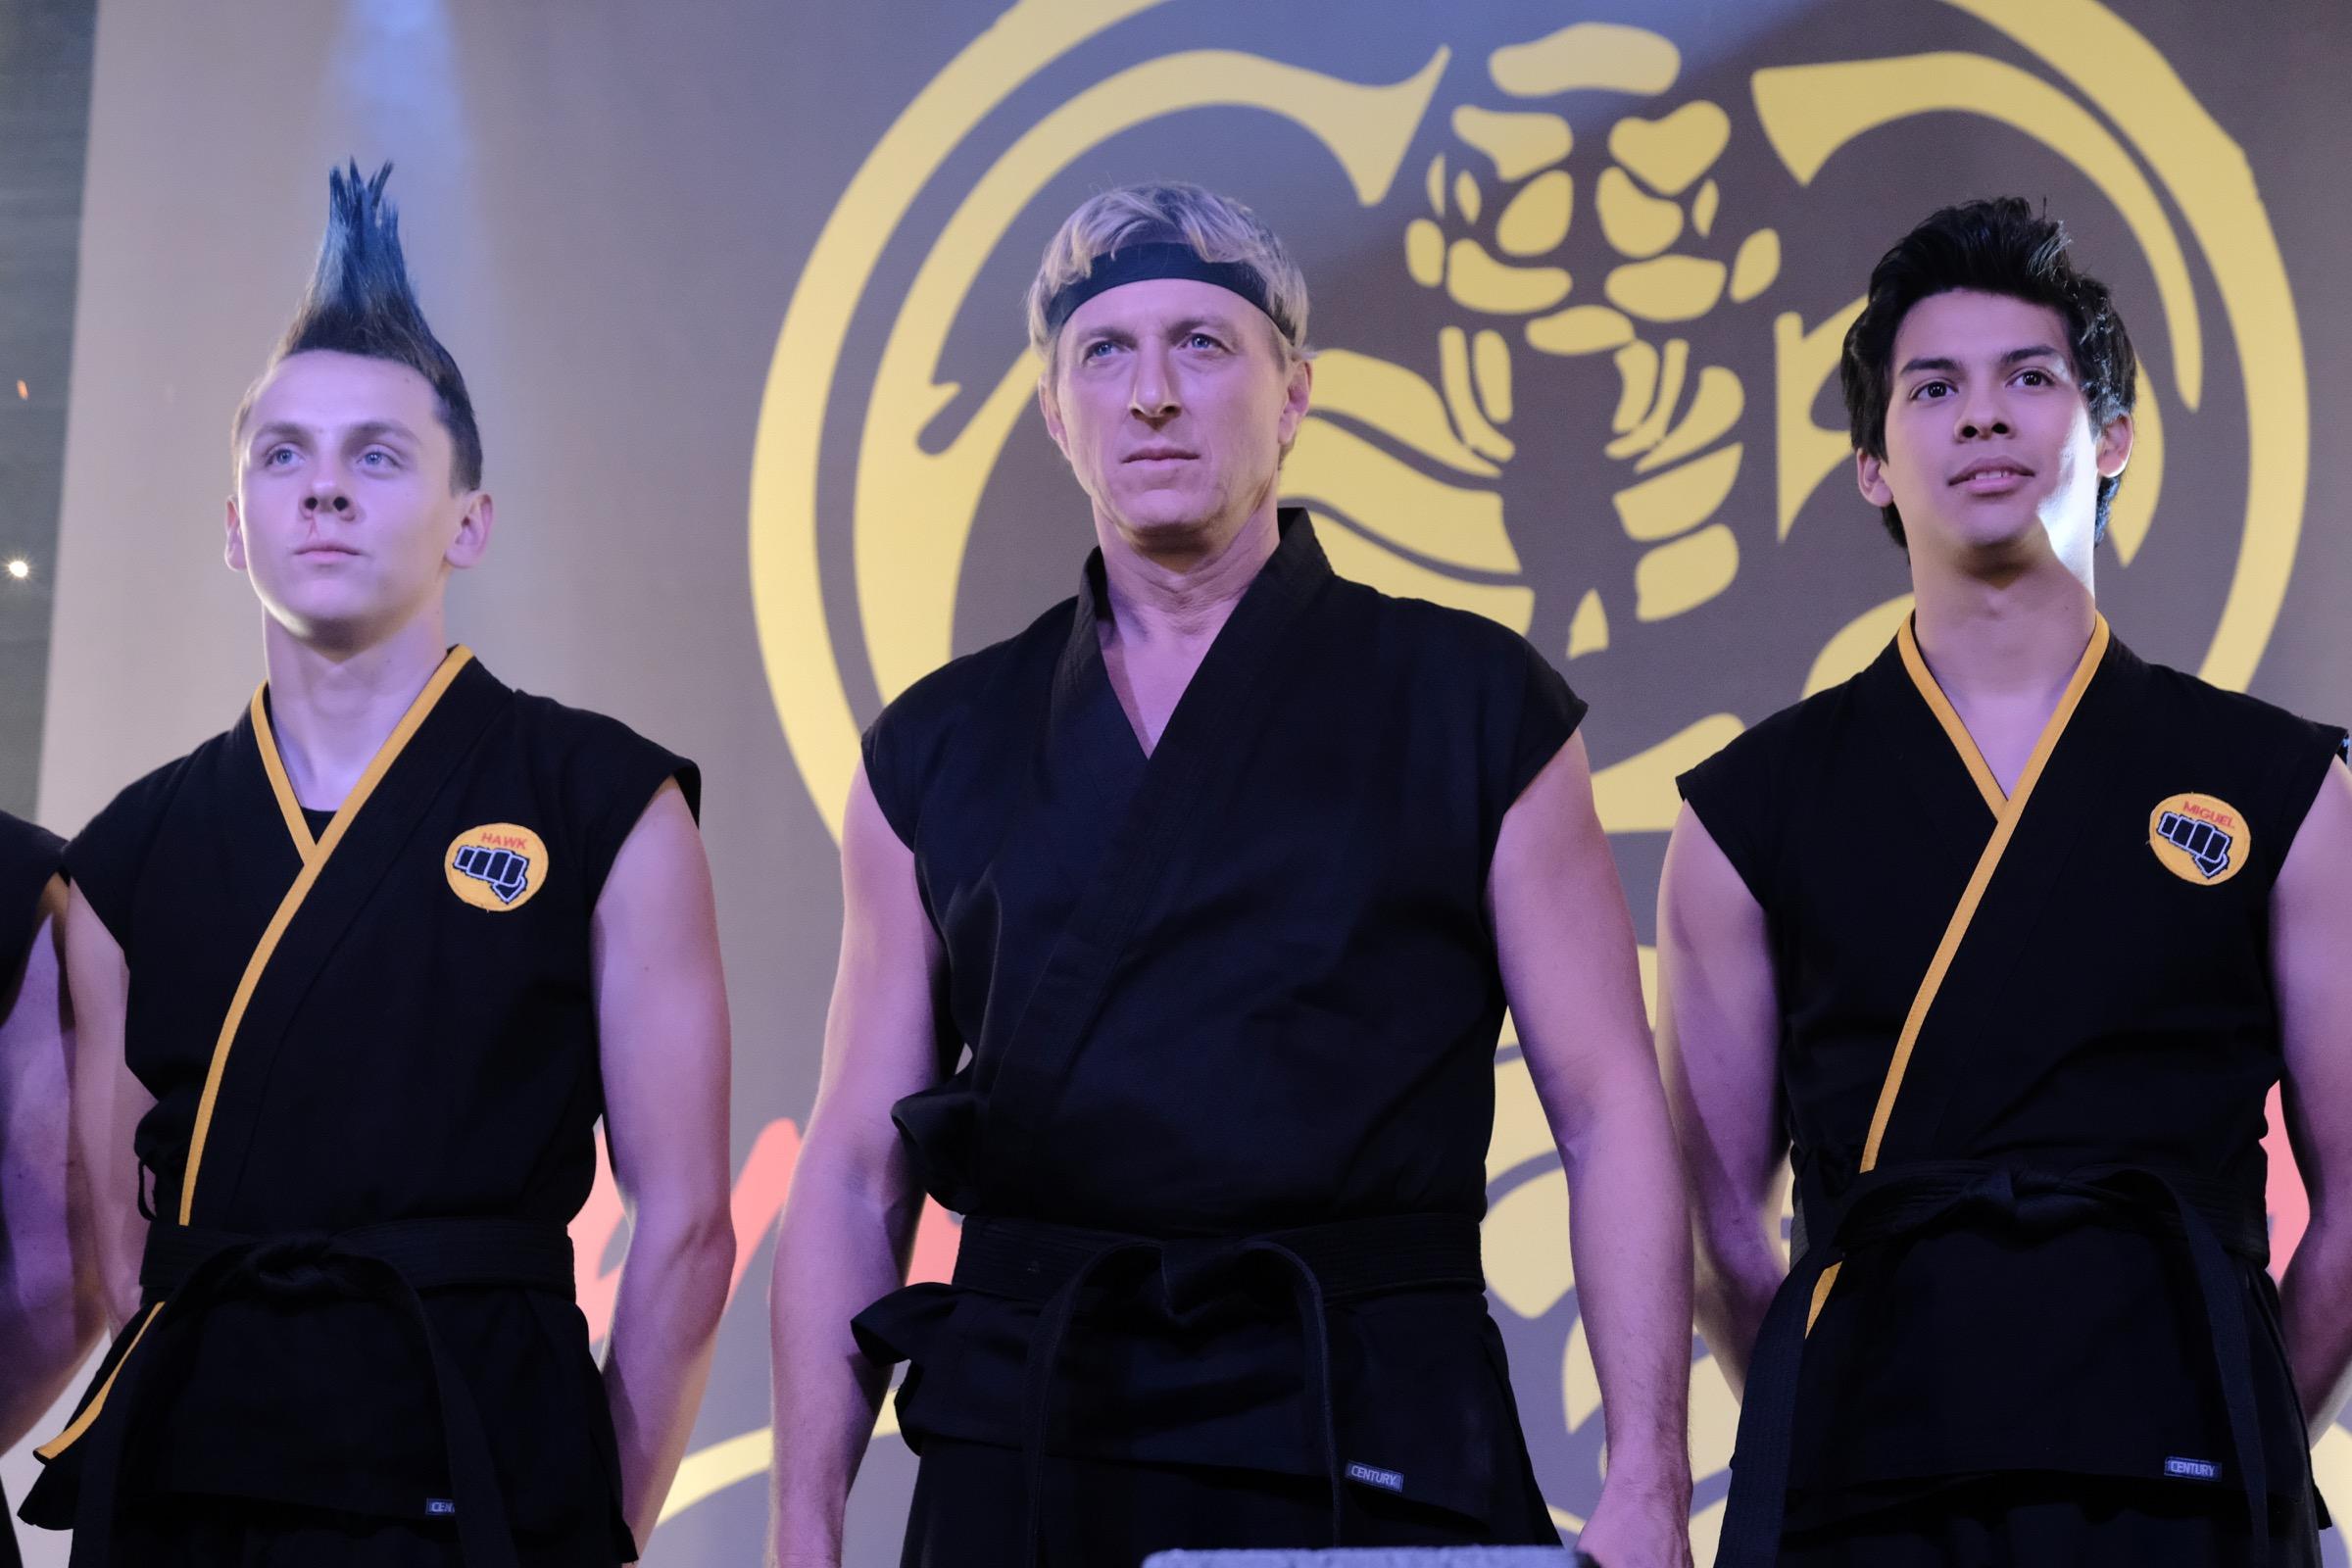 Cobra Kai: Ο 3ος κύκλος της σειράς (του τηλεοπτικού hit του '80) έρχεται στο Netflix και οι τηλεθεατές έχουν τρελαθεί